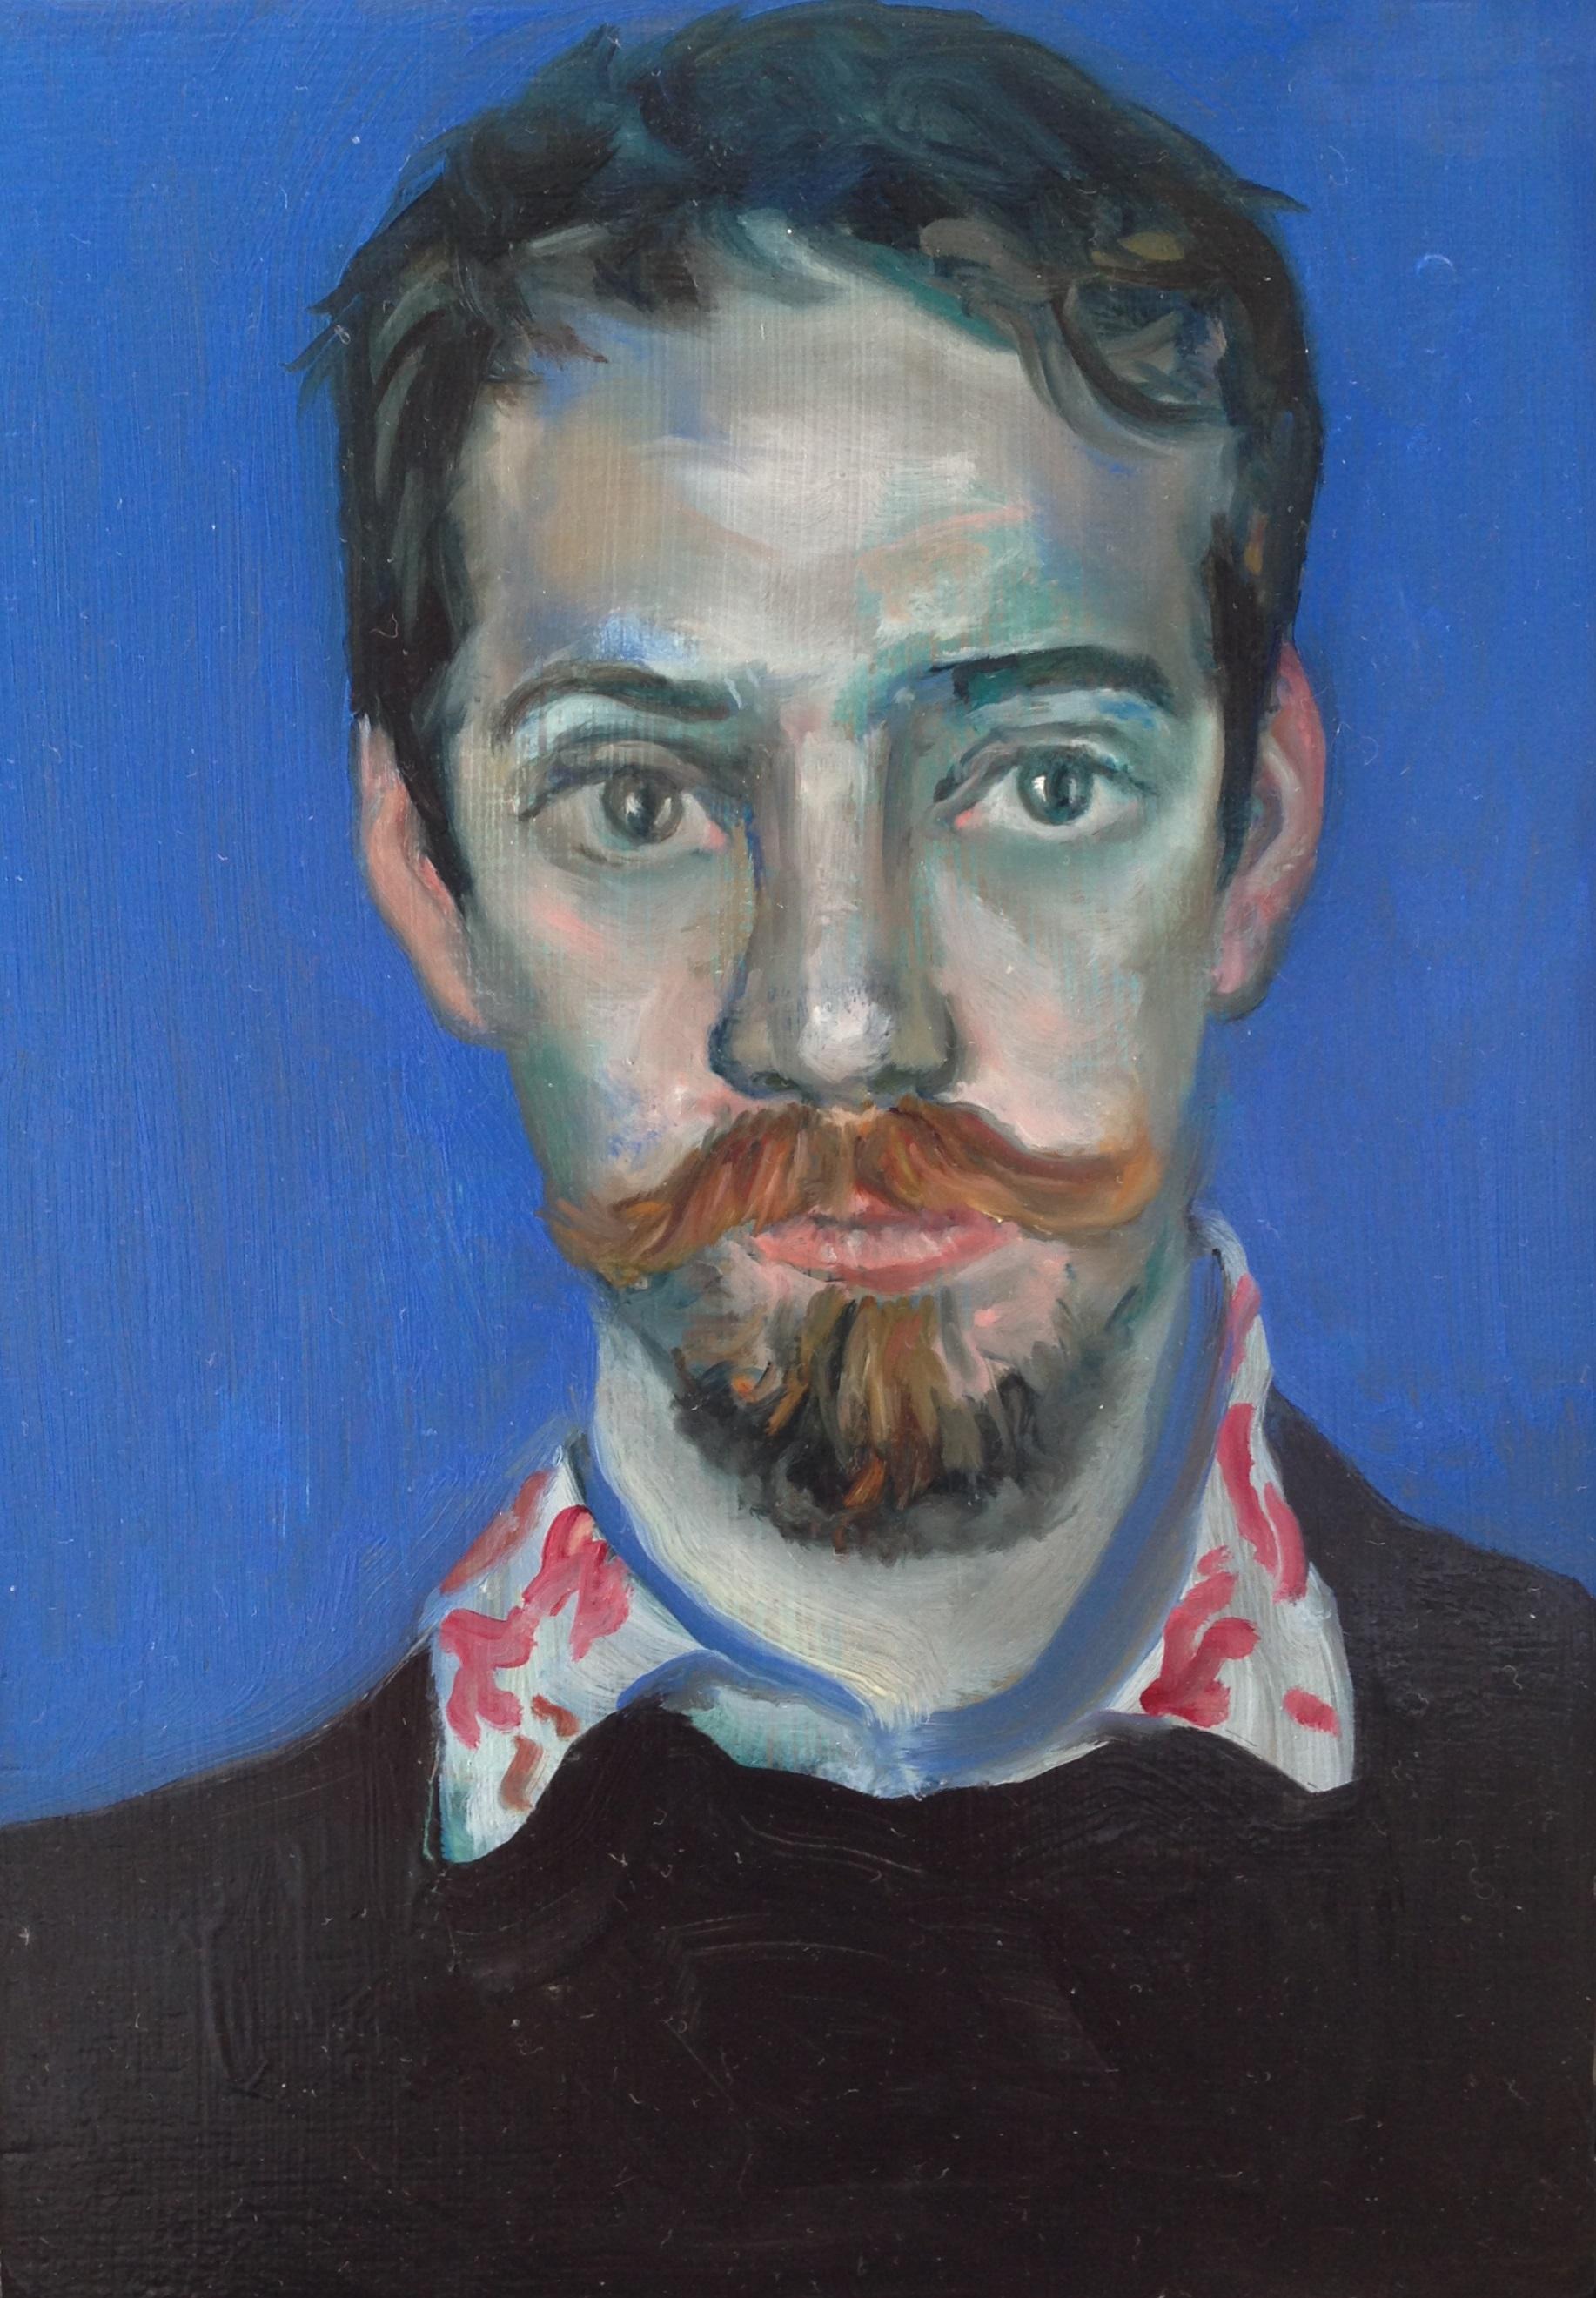 'Portrait of Conor' by Conrad Frankel, oil on canvas, 10cm x 15cm